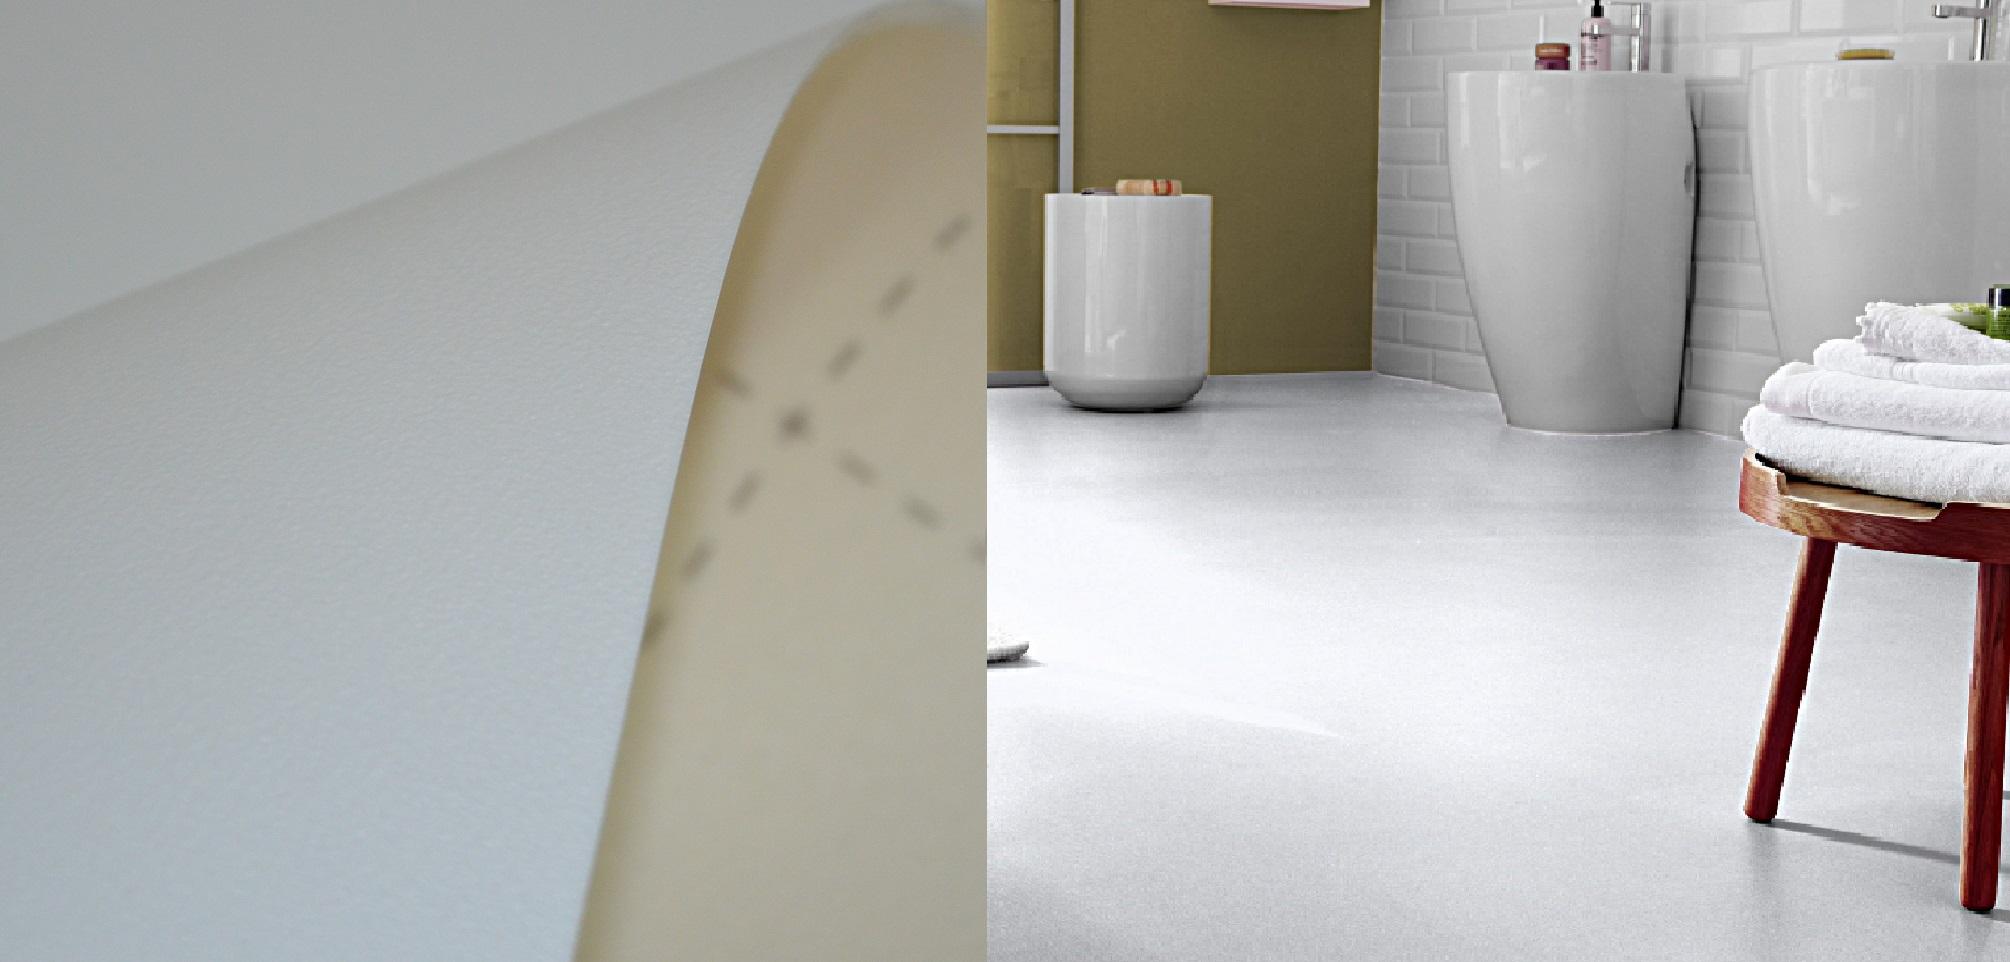 Koberec KOBEREC, PVC biele výstavy show svadobné 300x350cm